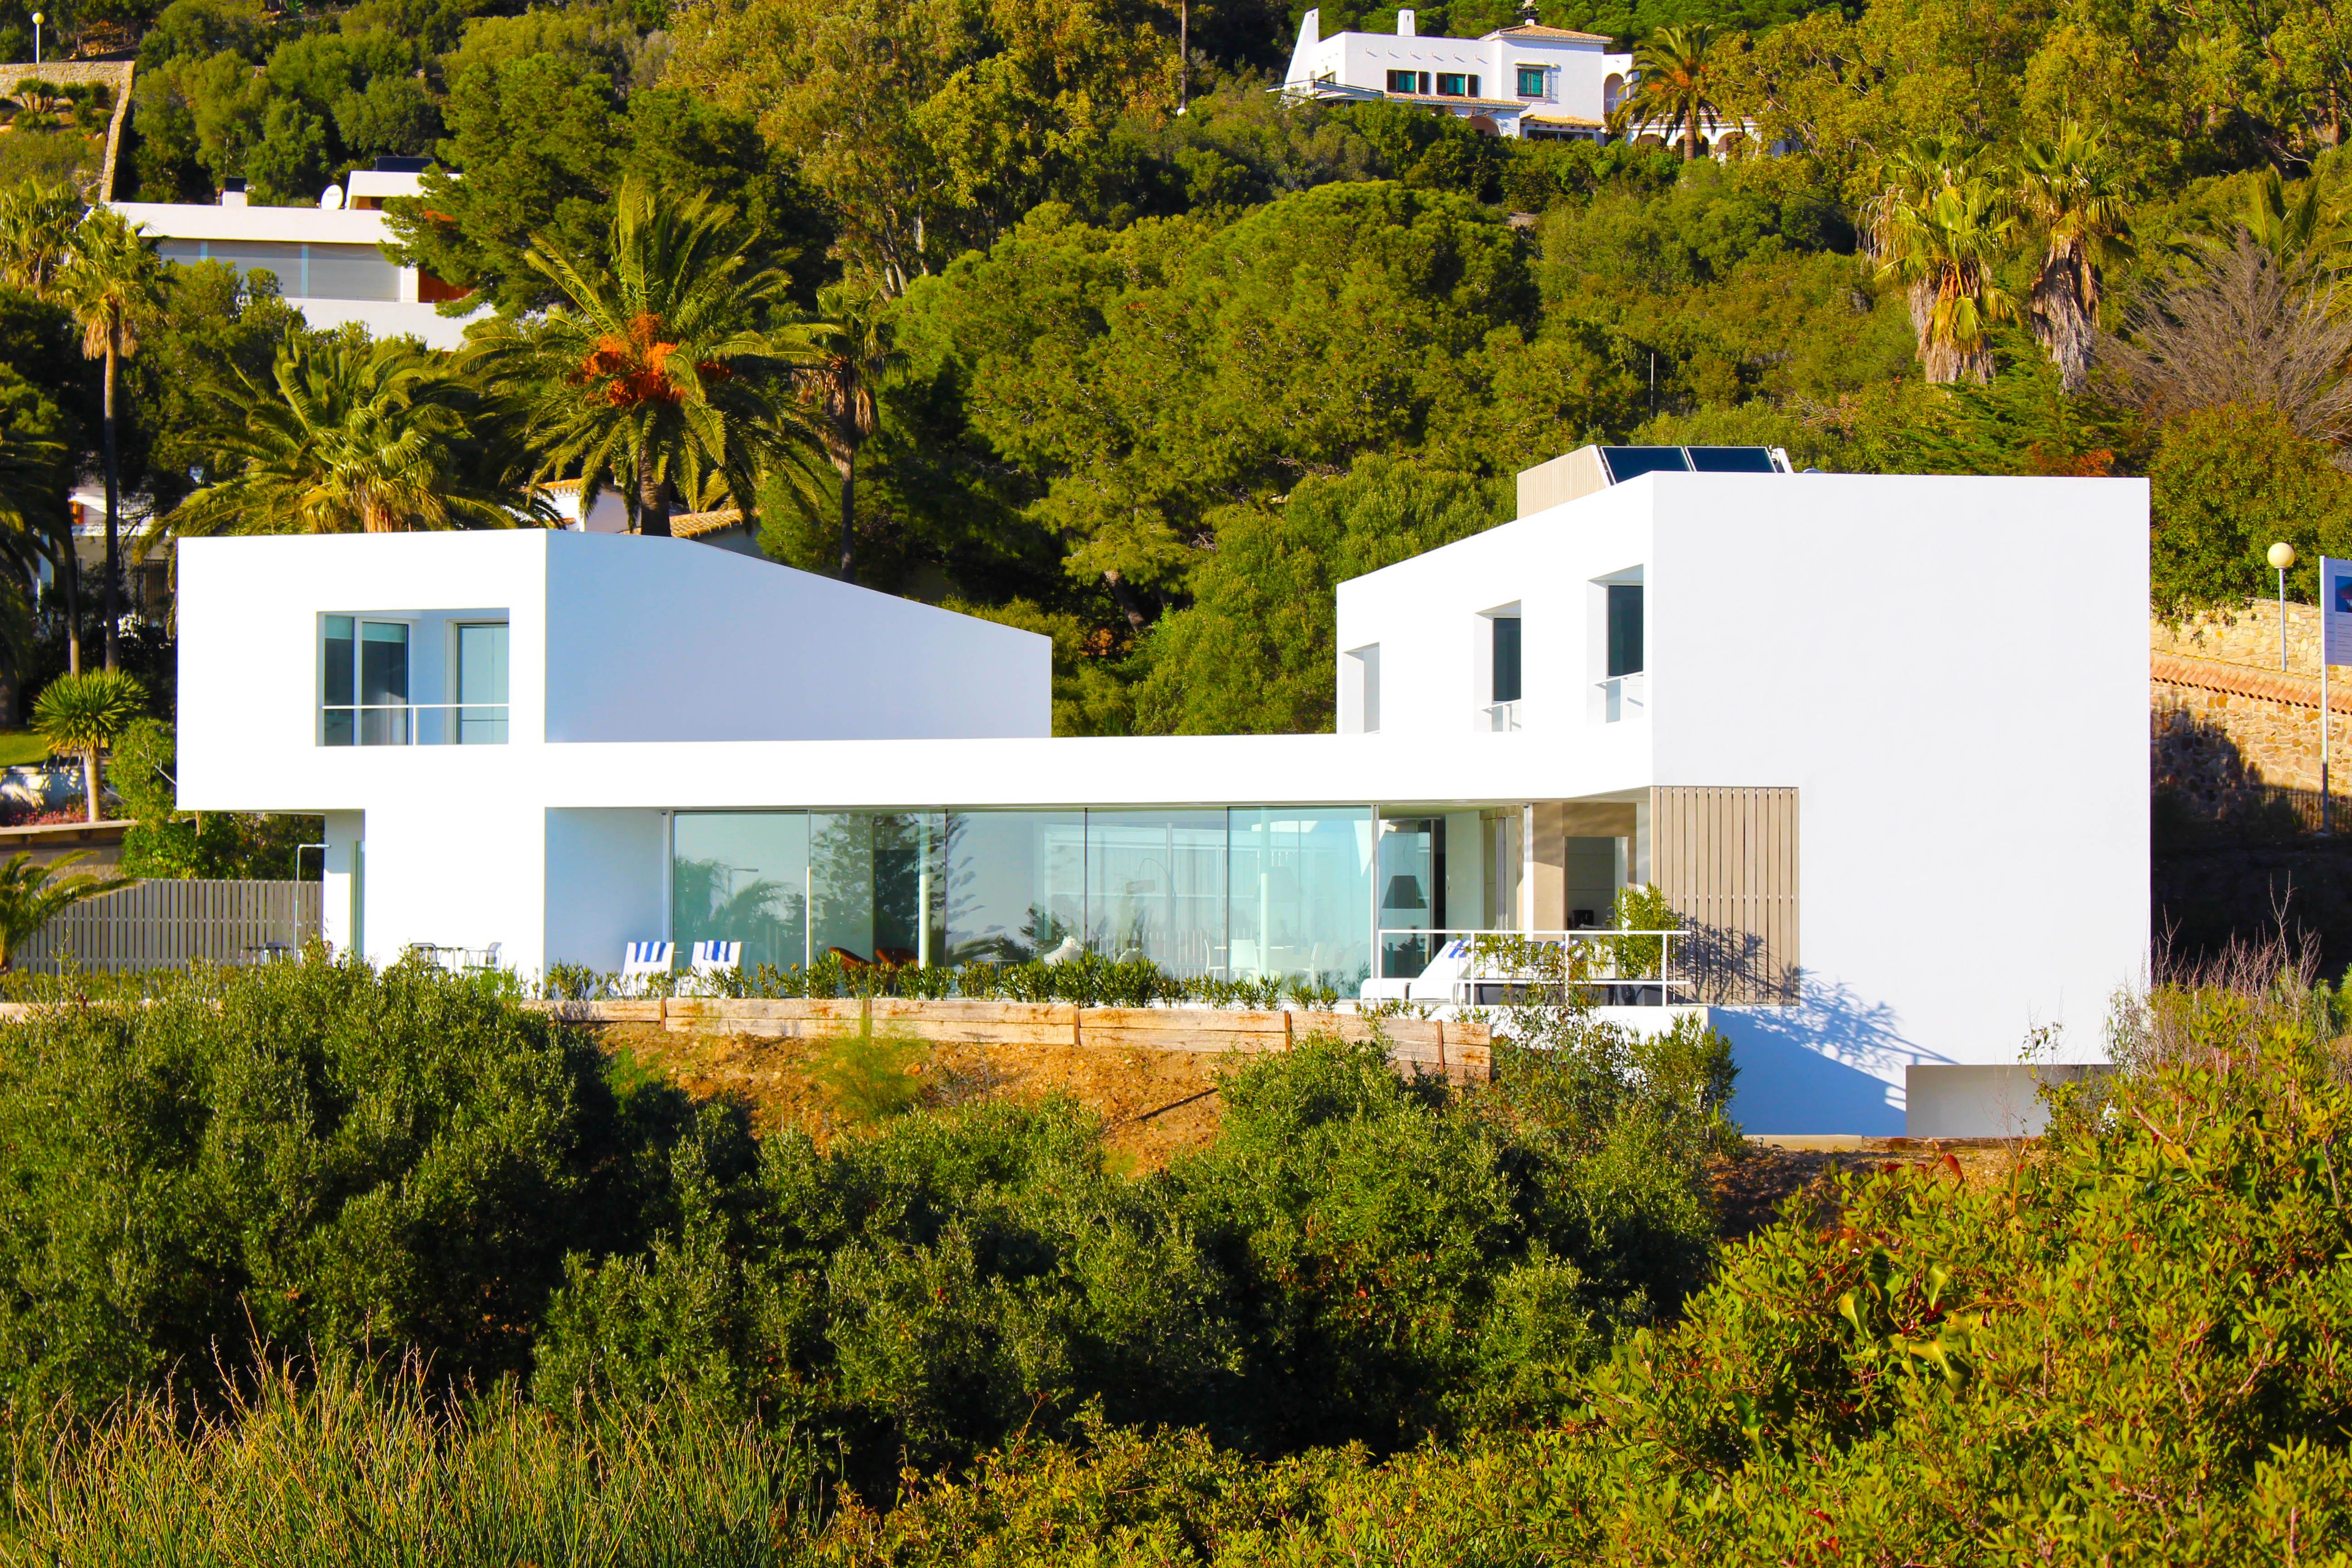 The Villa J9